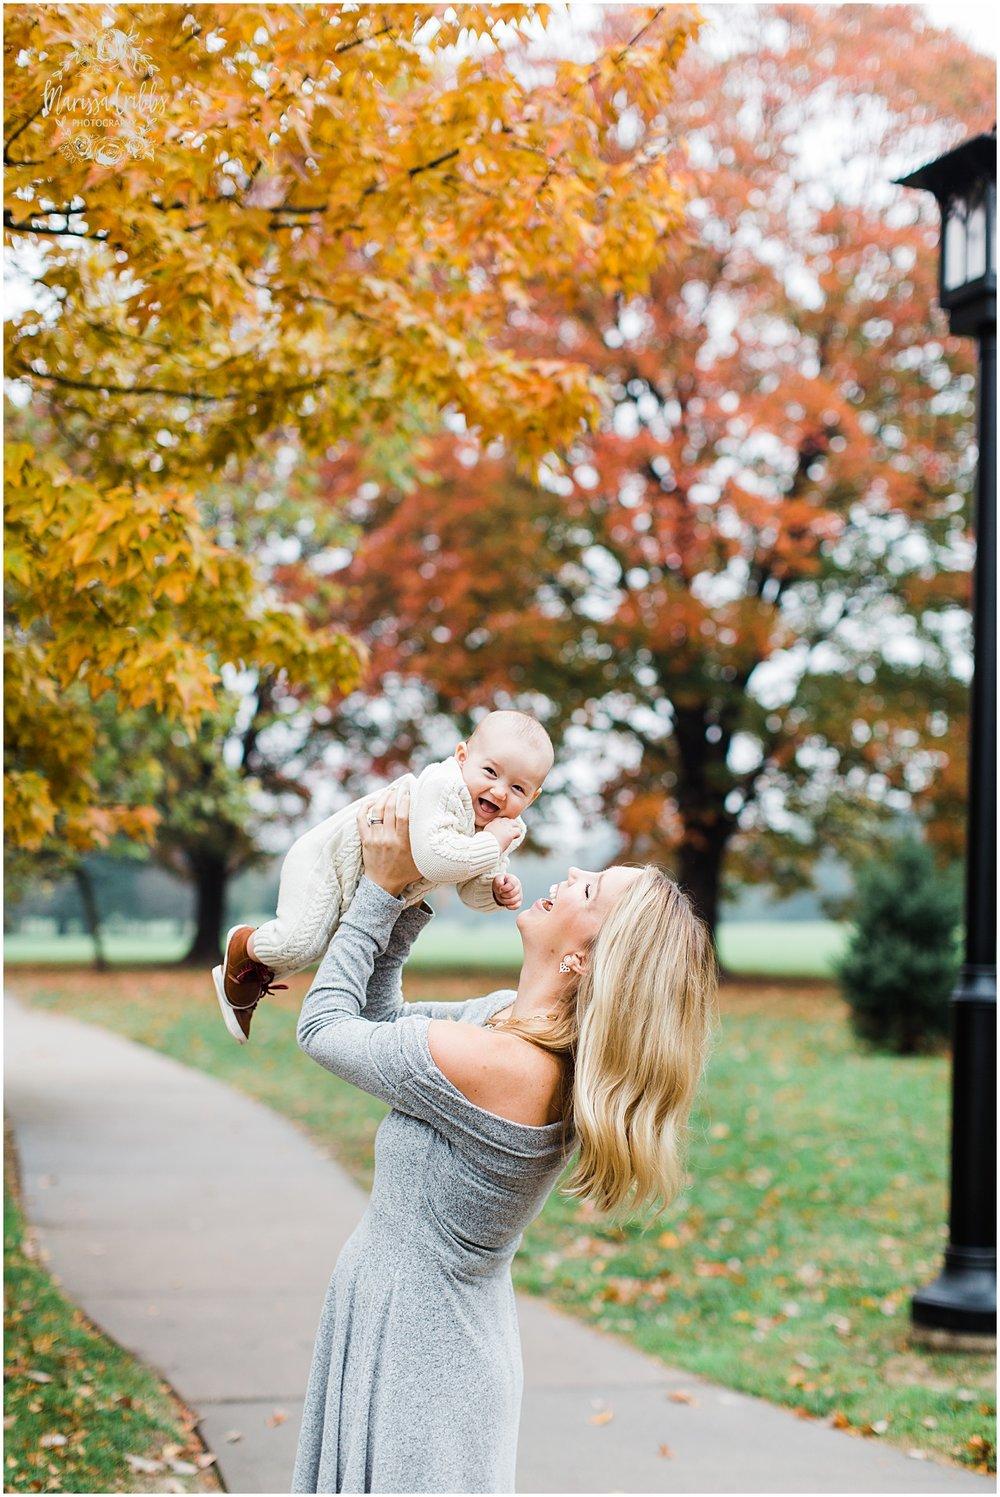 MILLER FAMILY LOOSE PARK | MARISSA CRIBBS PHOTOGRAPHY | KC FAMILY PHOTOGRAPHY_3794.jpg